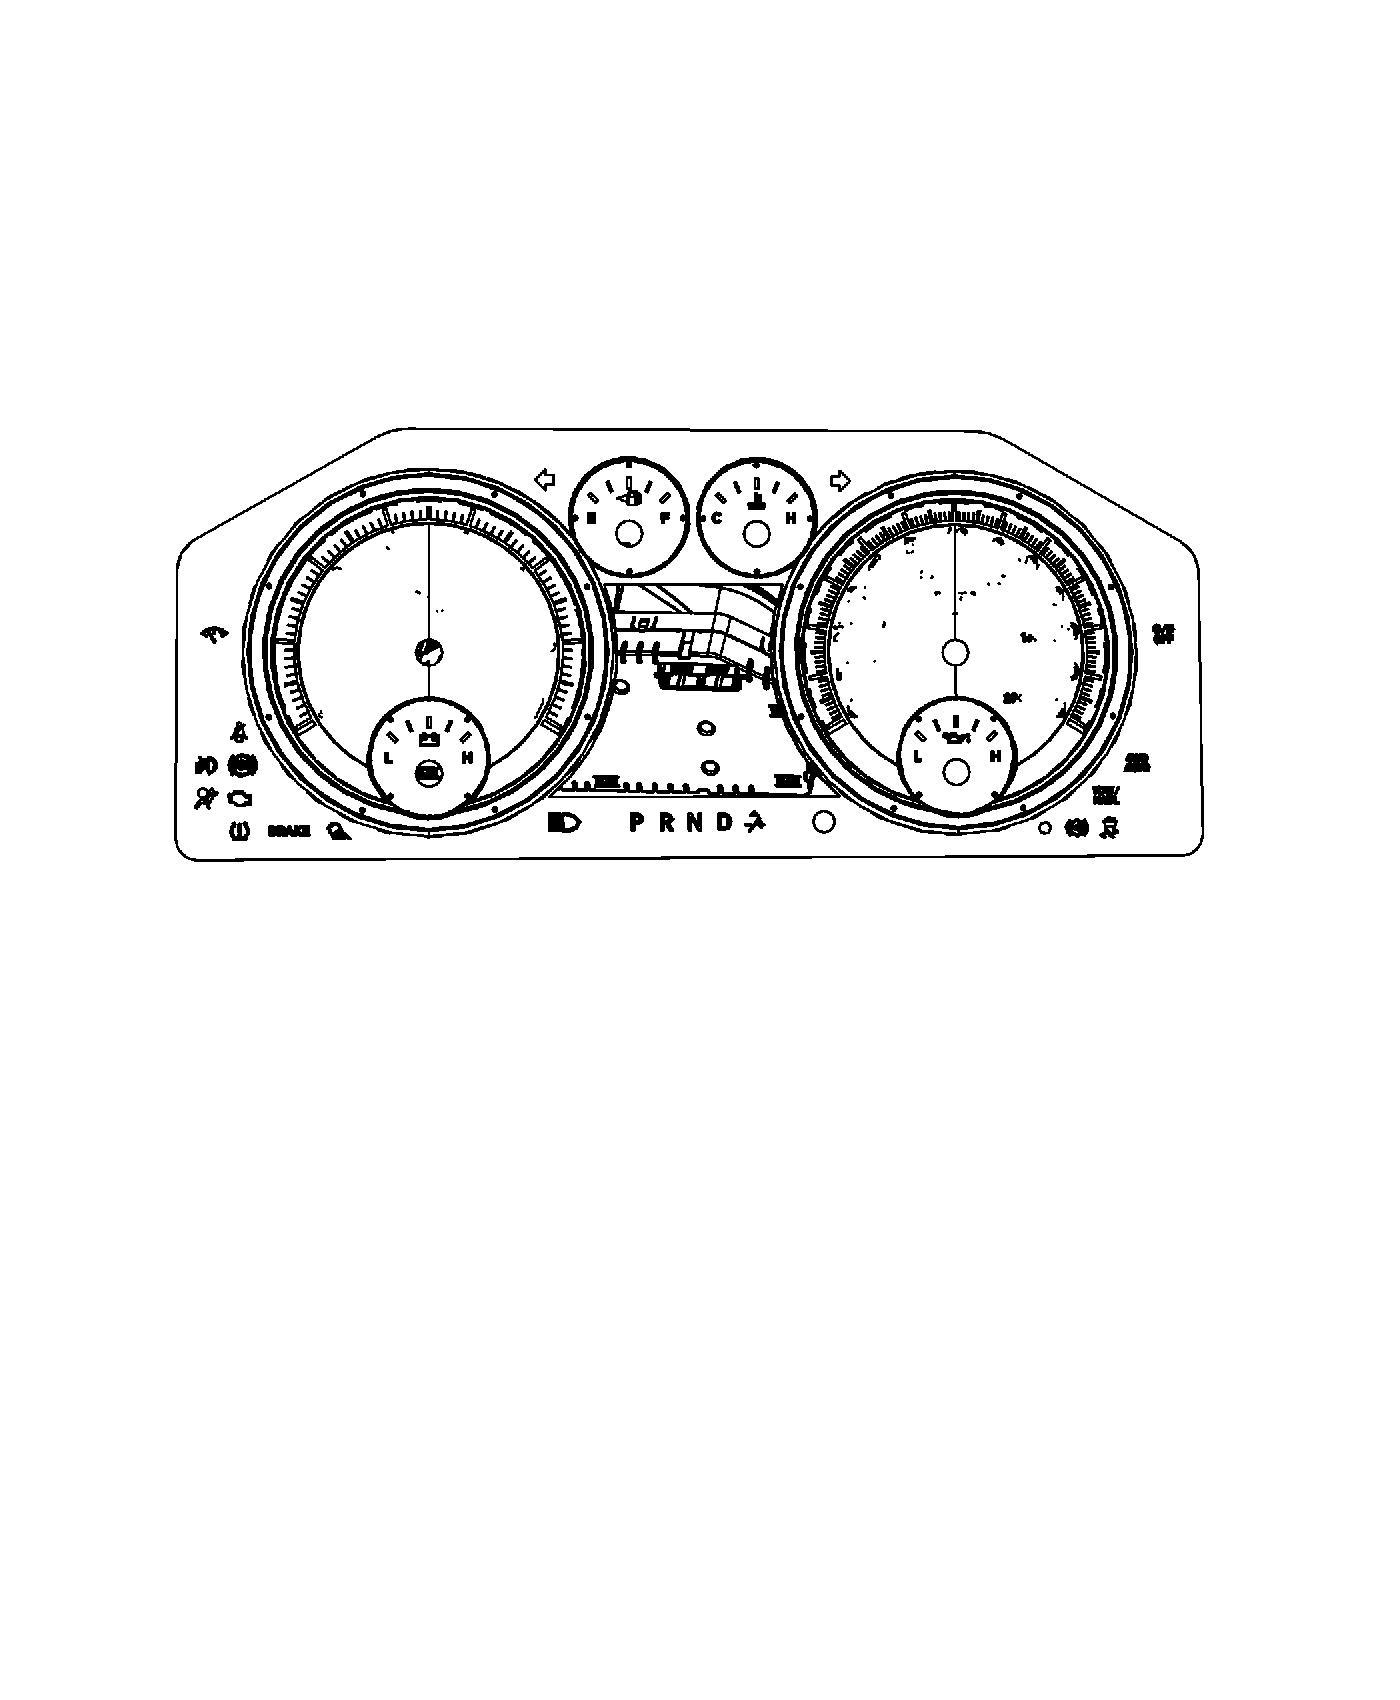 Ram Cluster Instrument Panel Instrument Cluster W